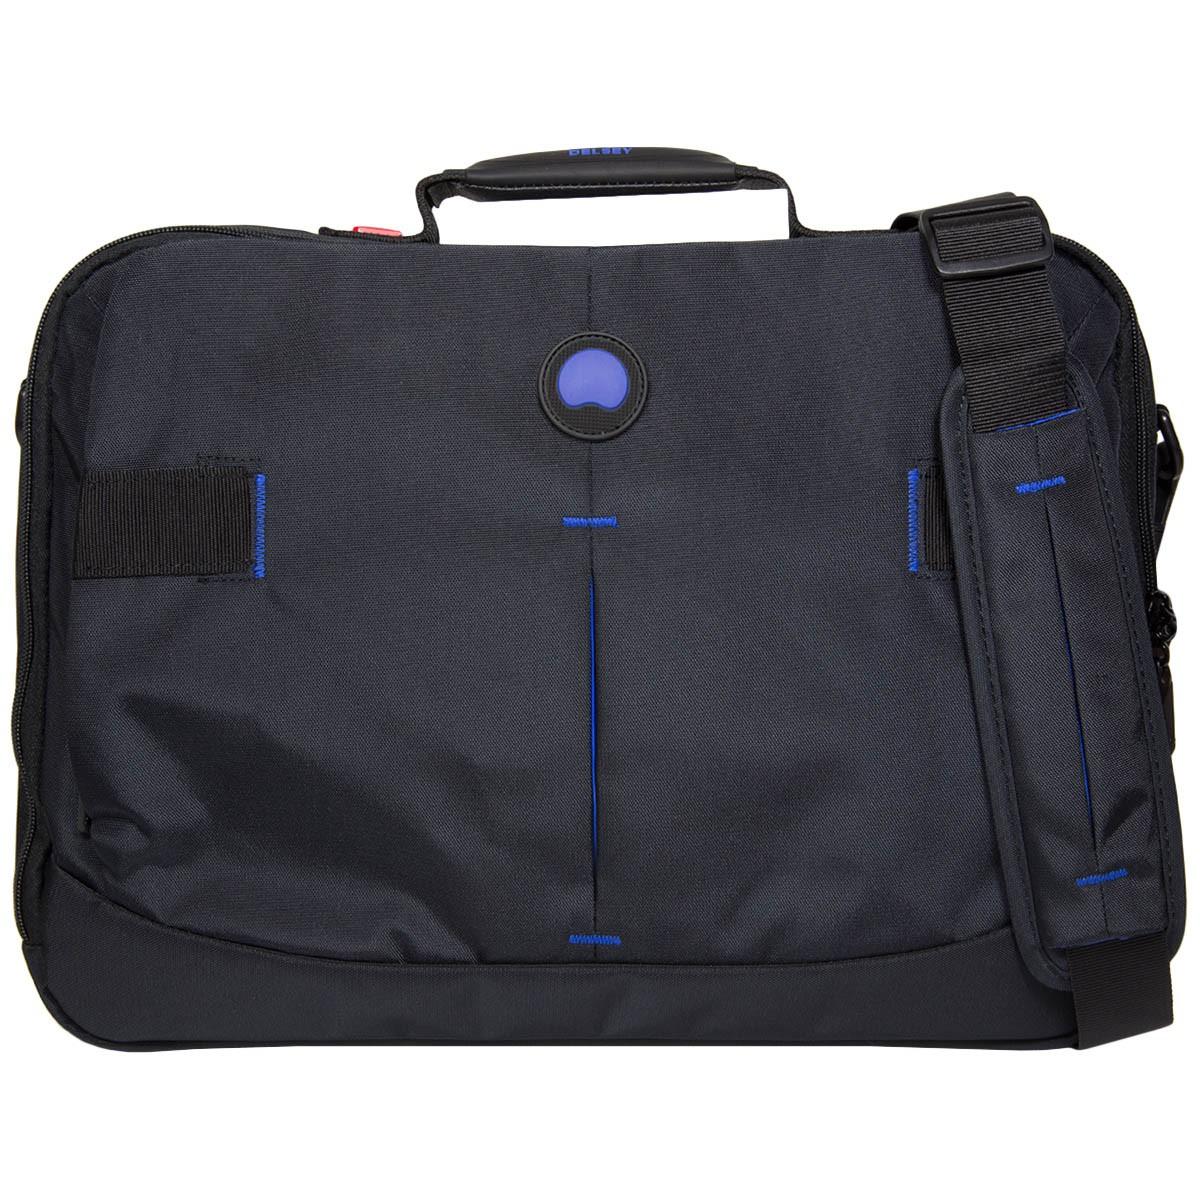 Delsey Pilo Notebooktasche Messenger Laptoptasche